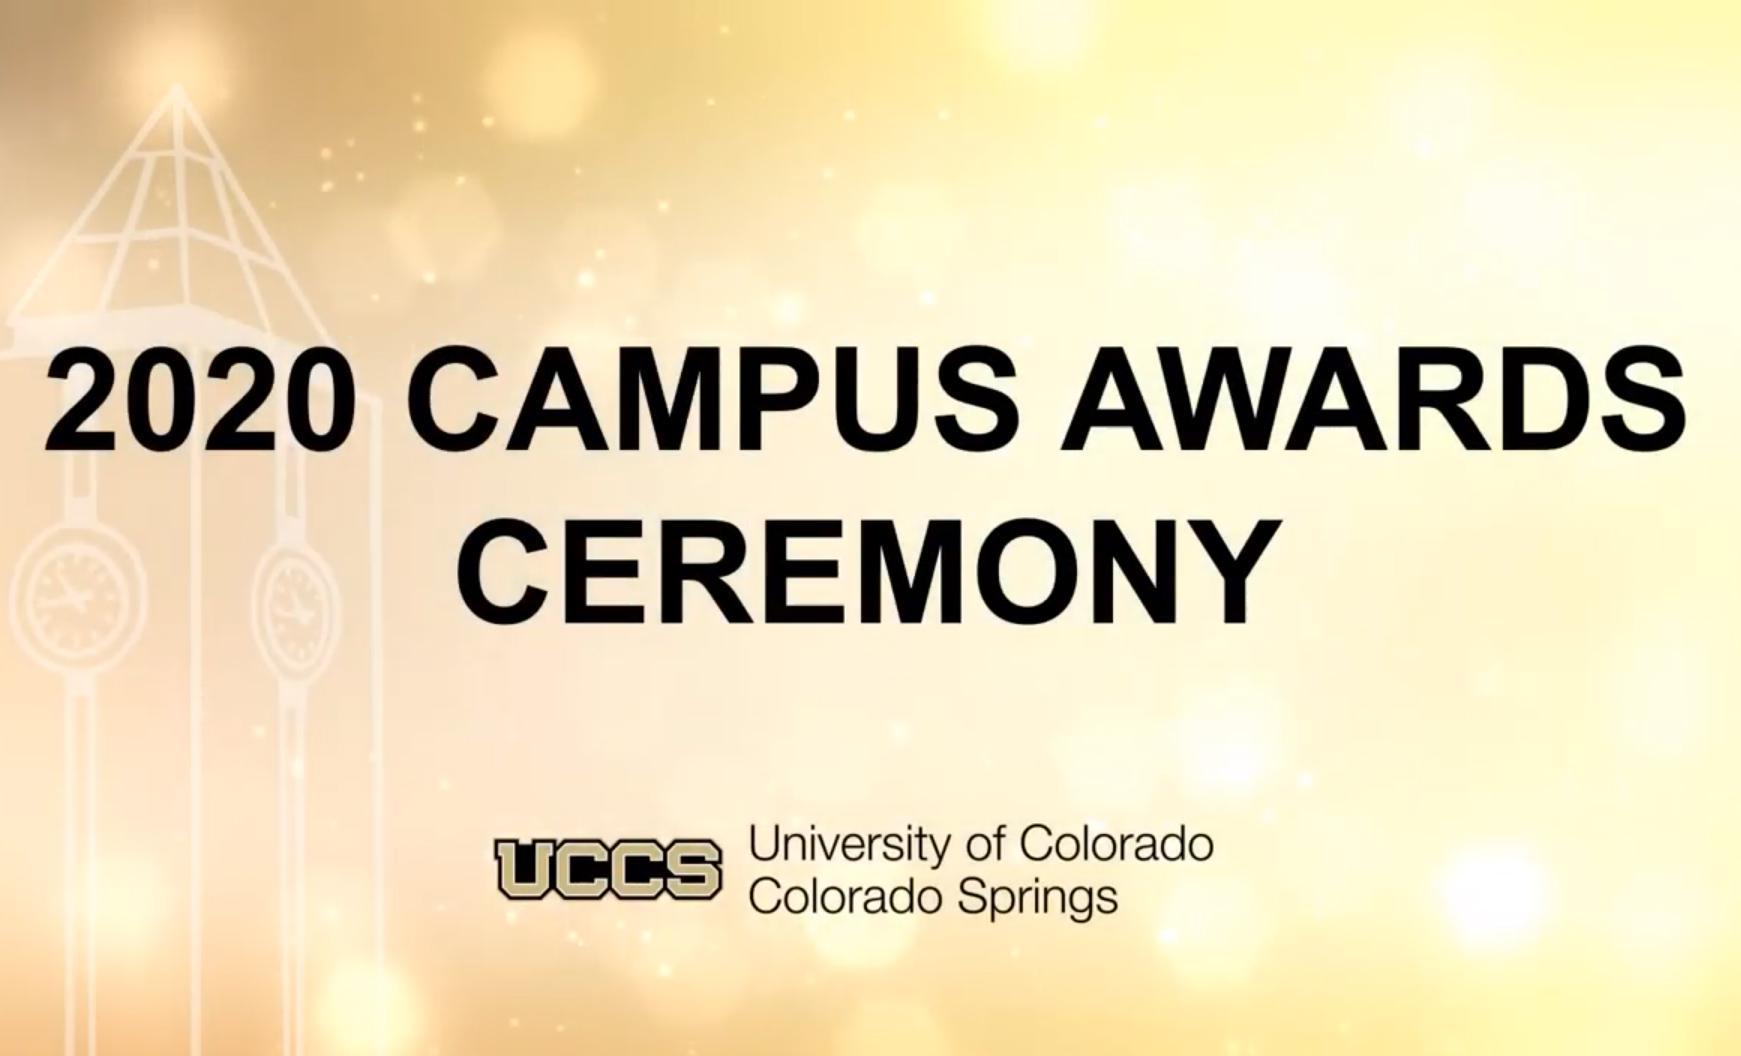 2020 Campus Awards Ceremony graphic